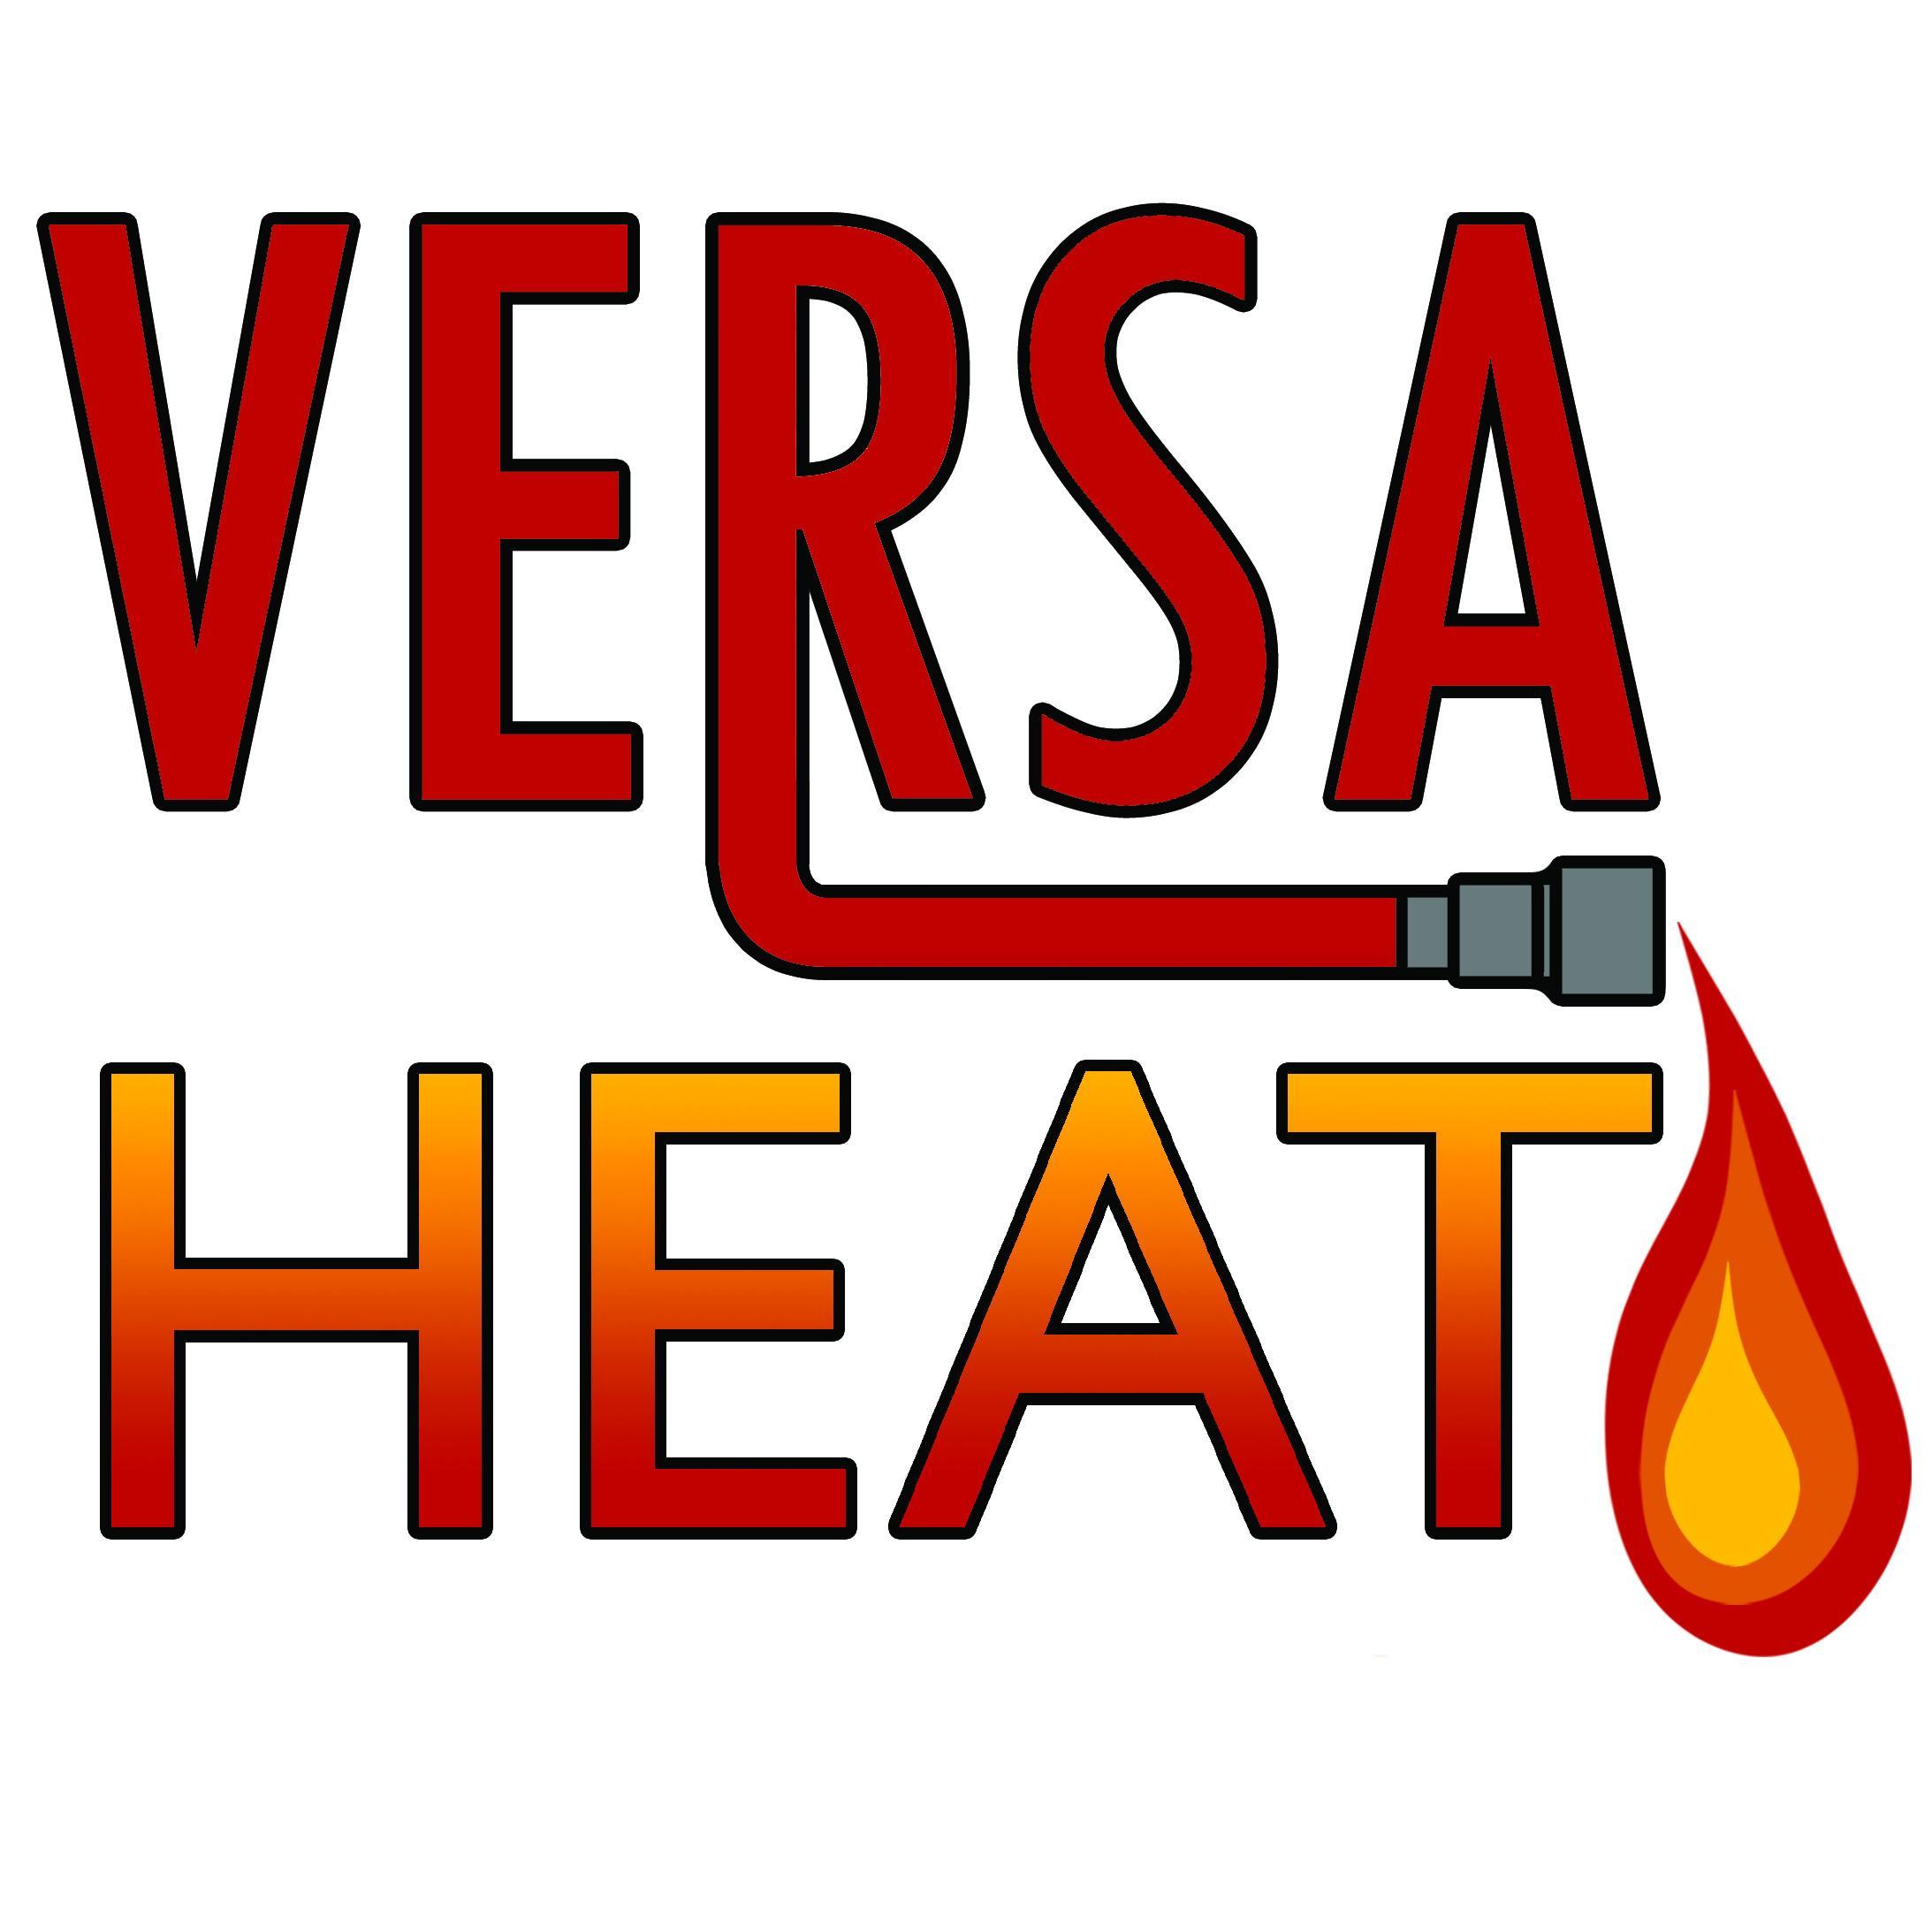 Versa Heat - Fort Collins, CO 80524 - (970)566-0228 | ShowMeLocal.com